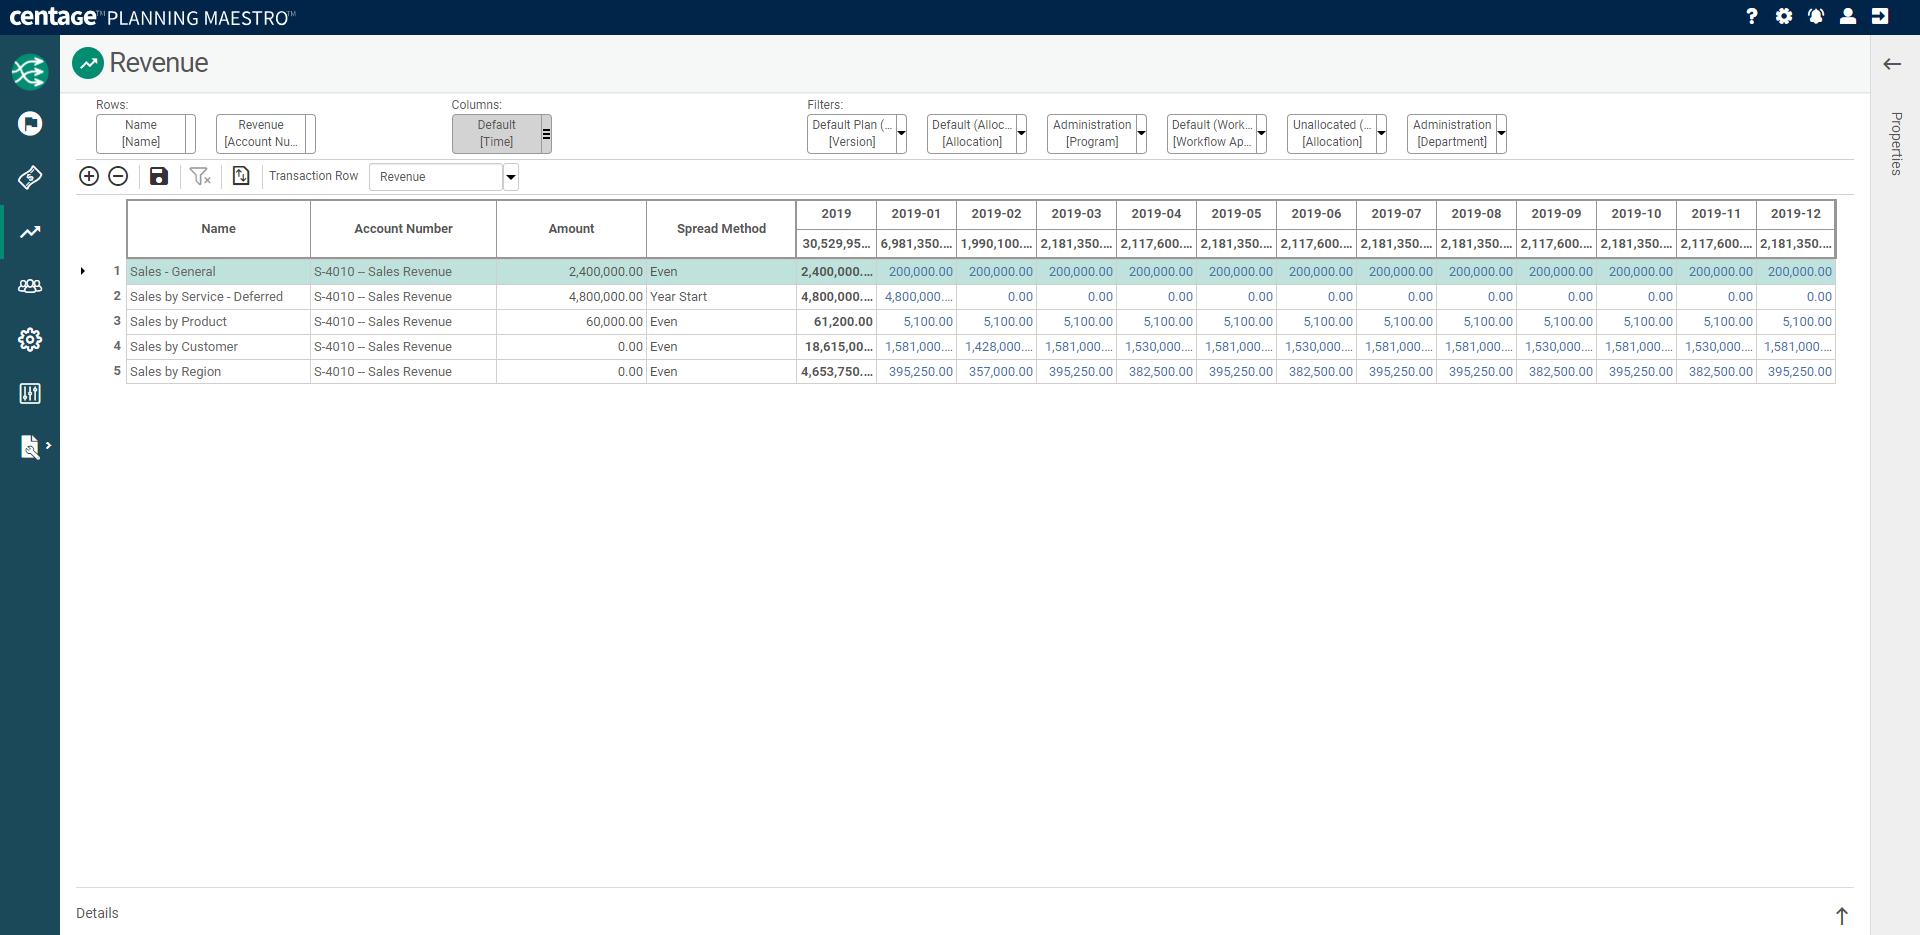 Planning Maestro Software - Revenue Planning